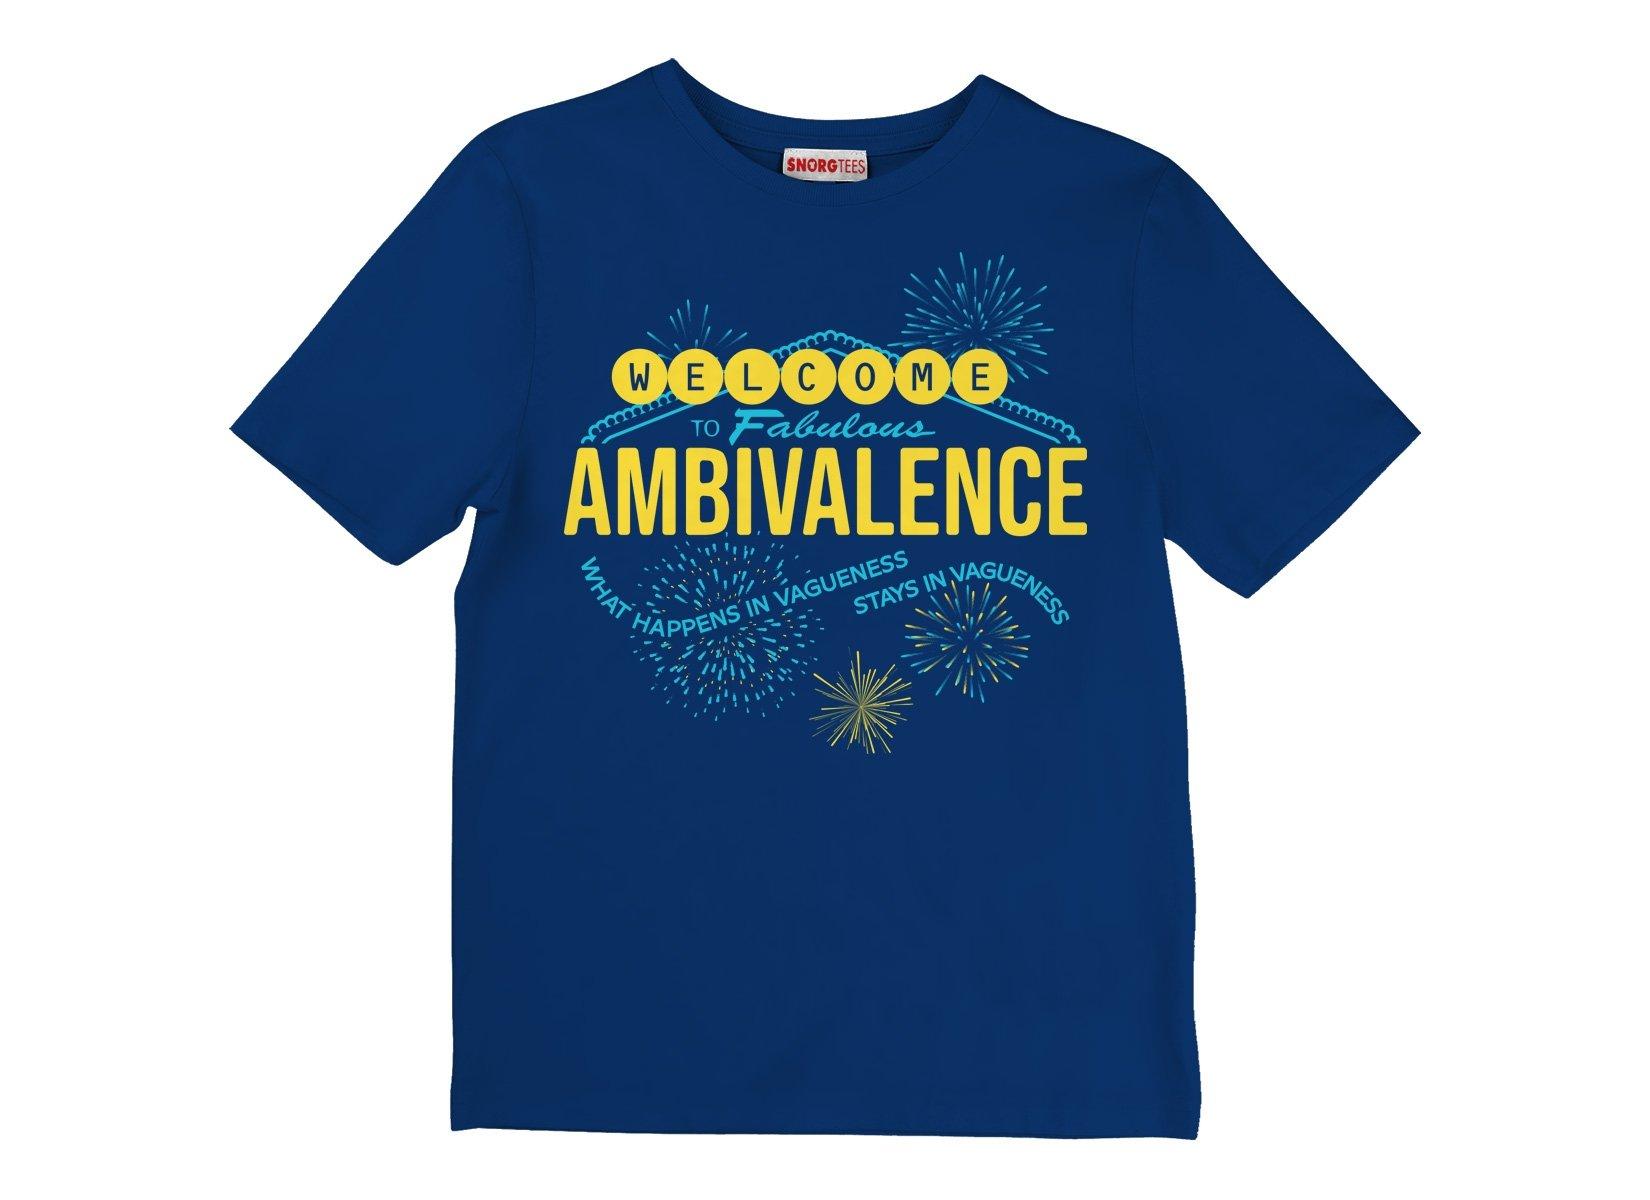 Welcome To Fabulous Ambivalence on Kids T-Shirt